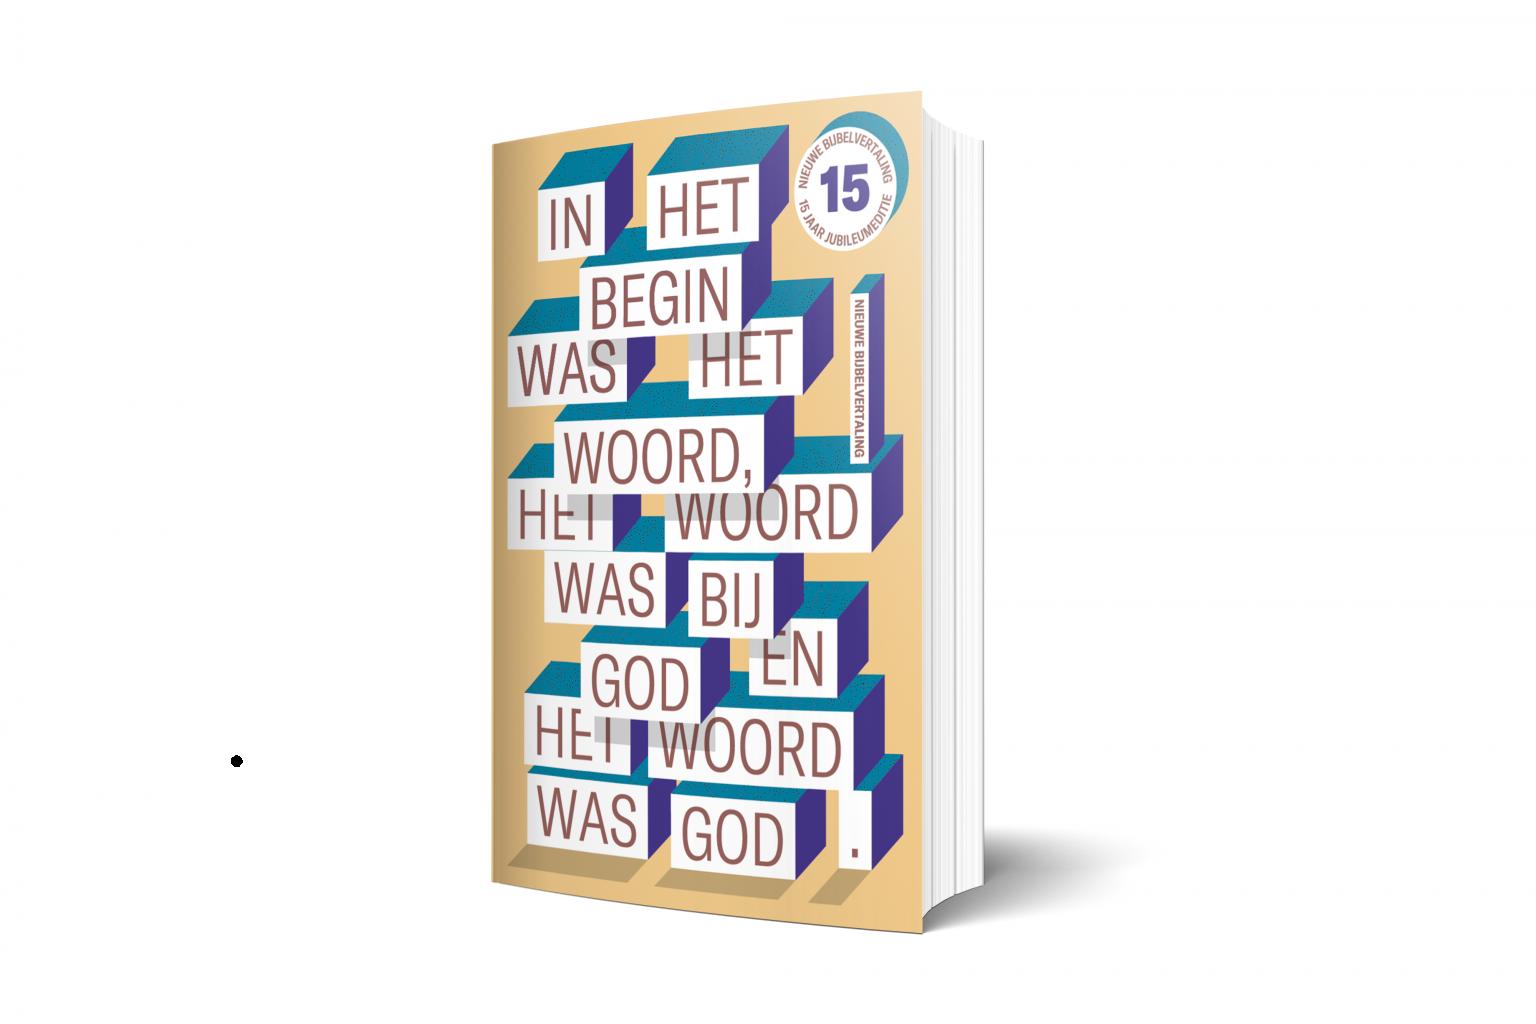 NBV-15-jaar-limited-edition-Johannes-11